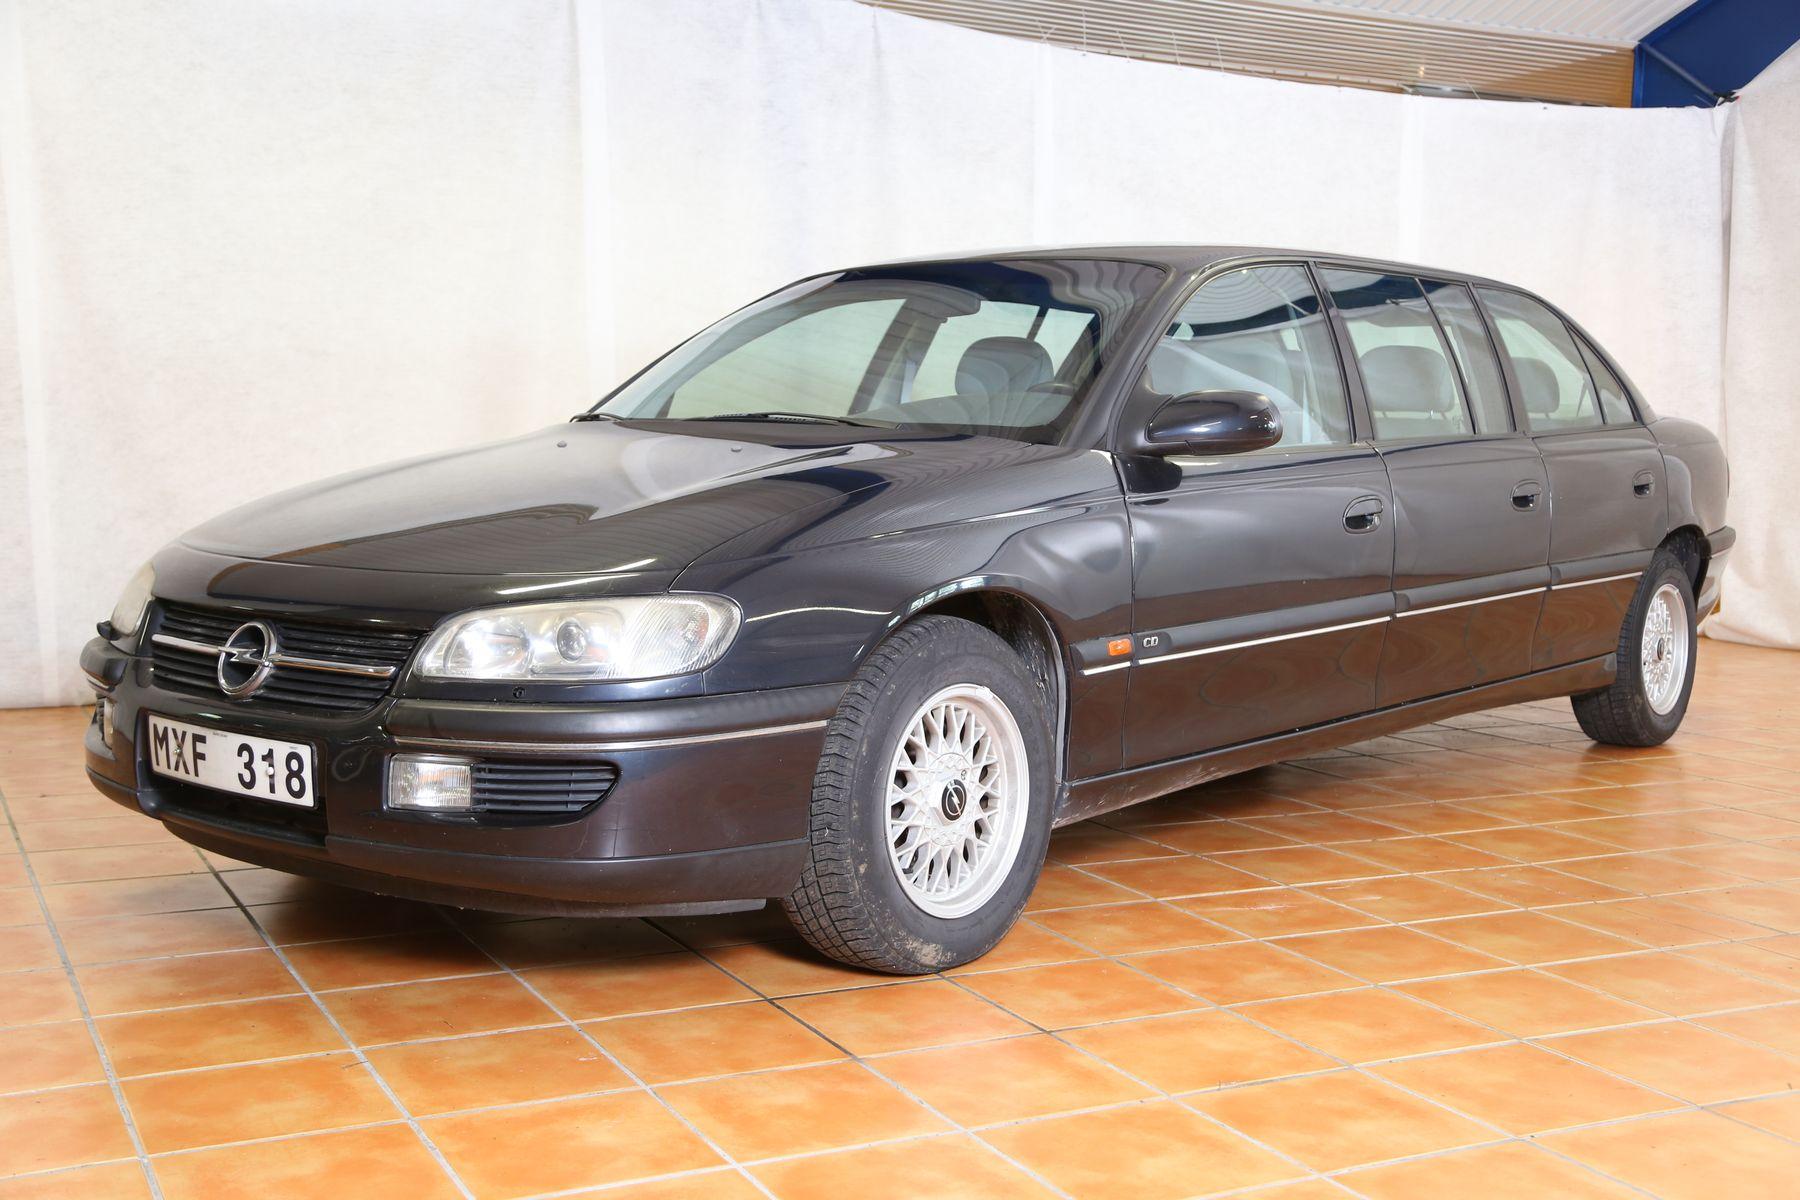 Opel Omega limousine CD 6-cyl — 1998 på Bilweb Auctions